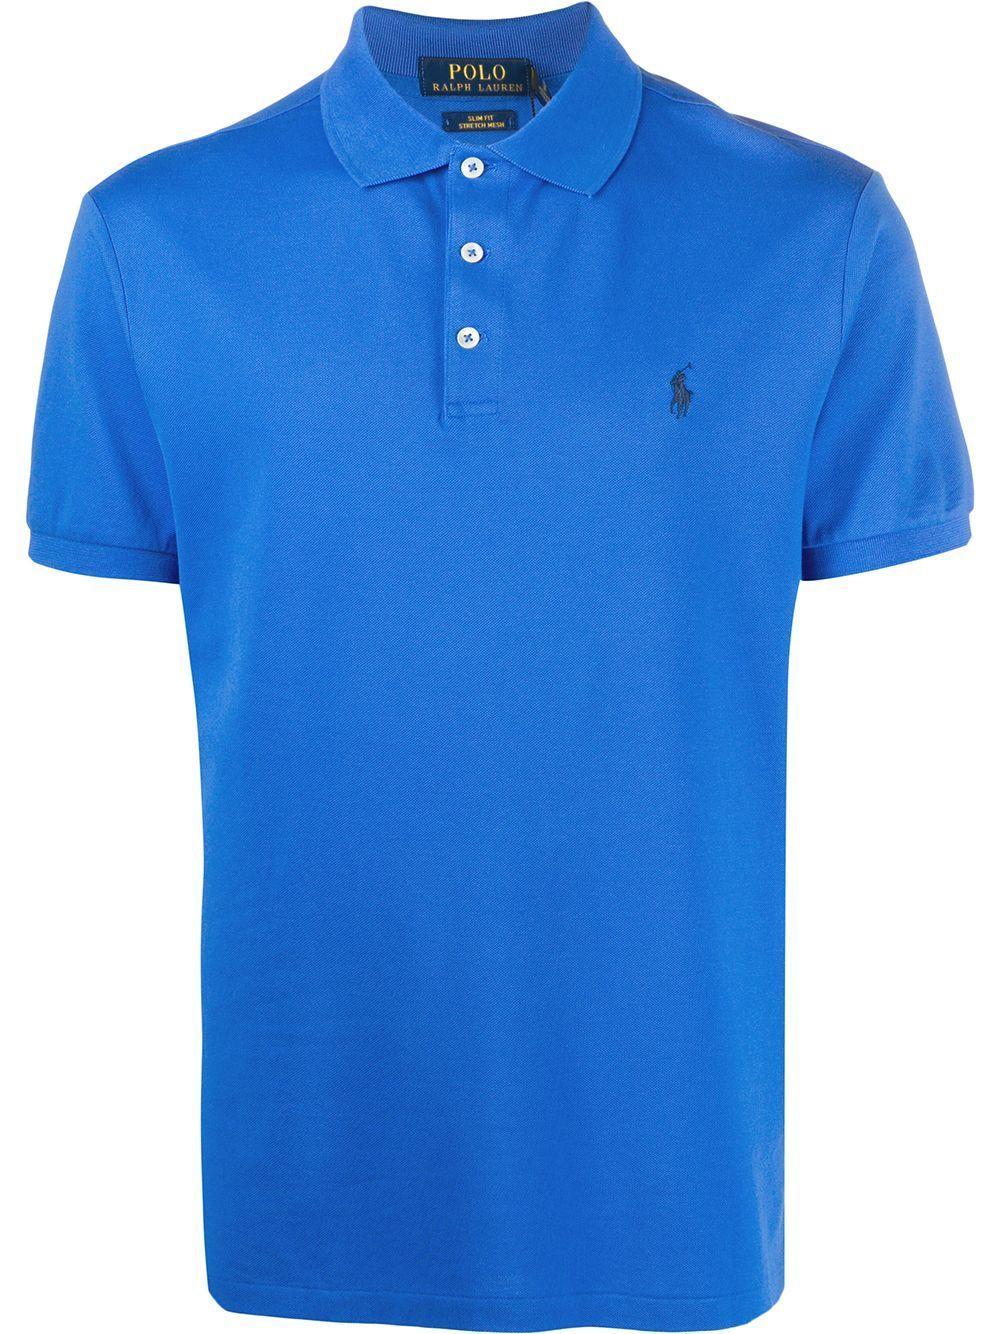 RALPH LAUREN MEN'S 710541705137 BLUE COTTON POLO SHIRT